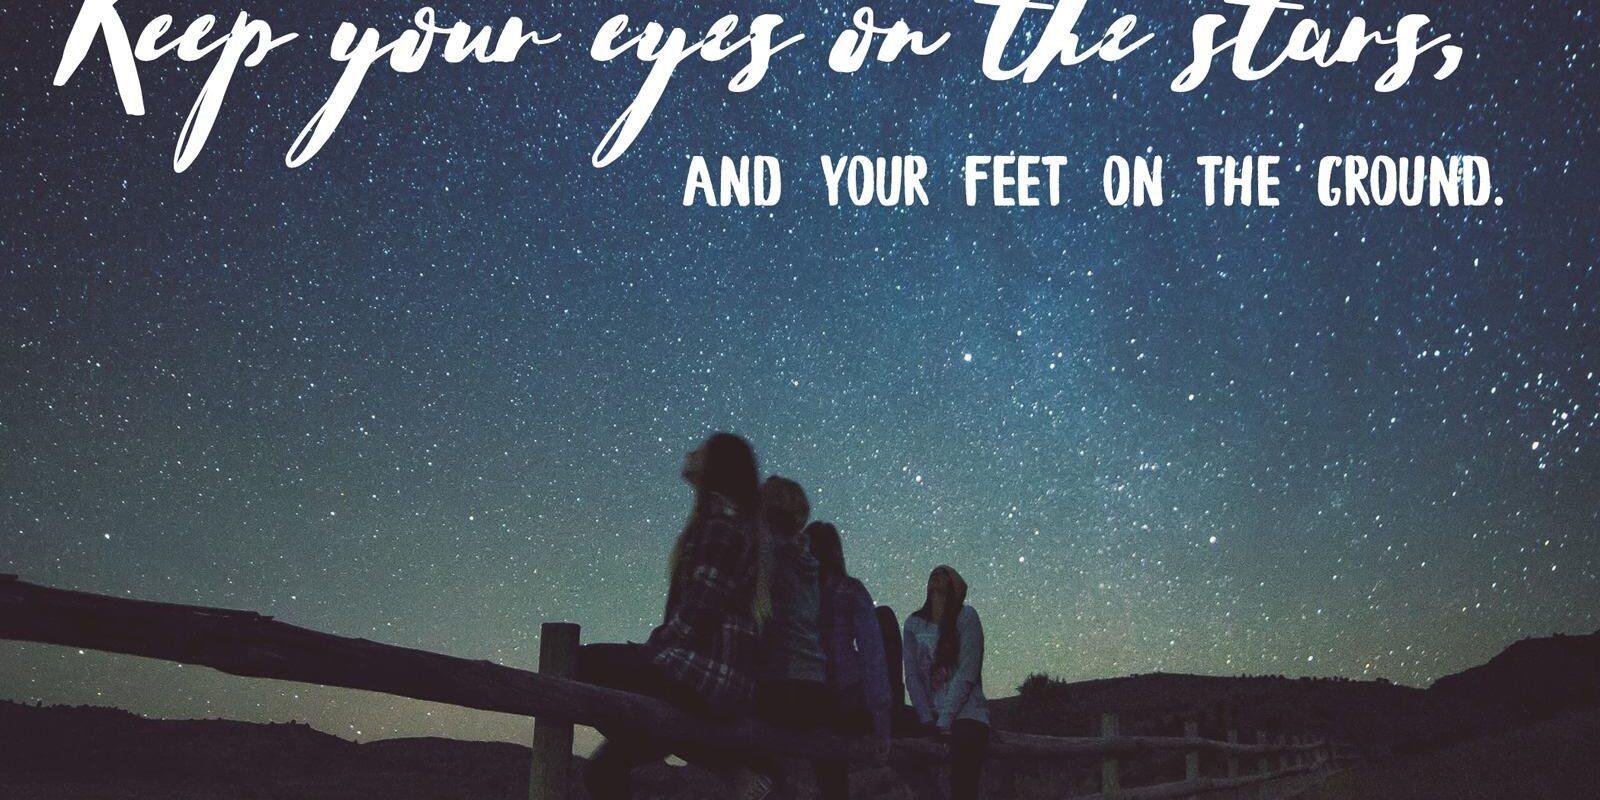 https://MartinaMcGowan.com Eyes on the stars